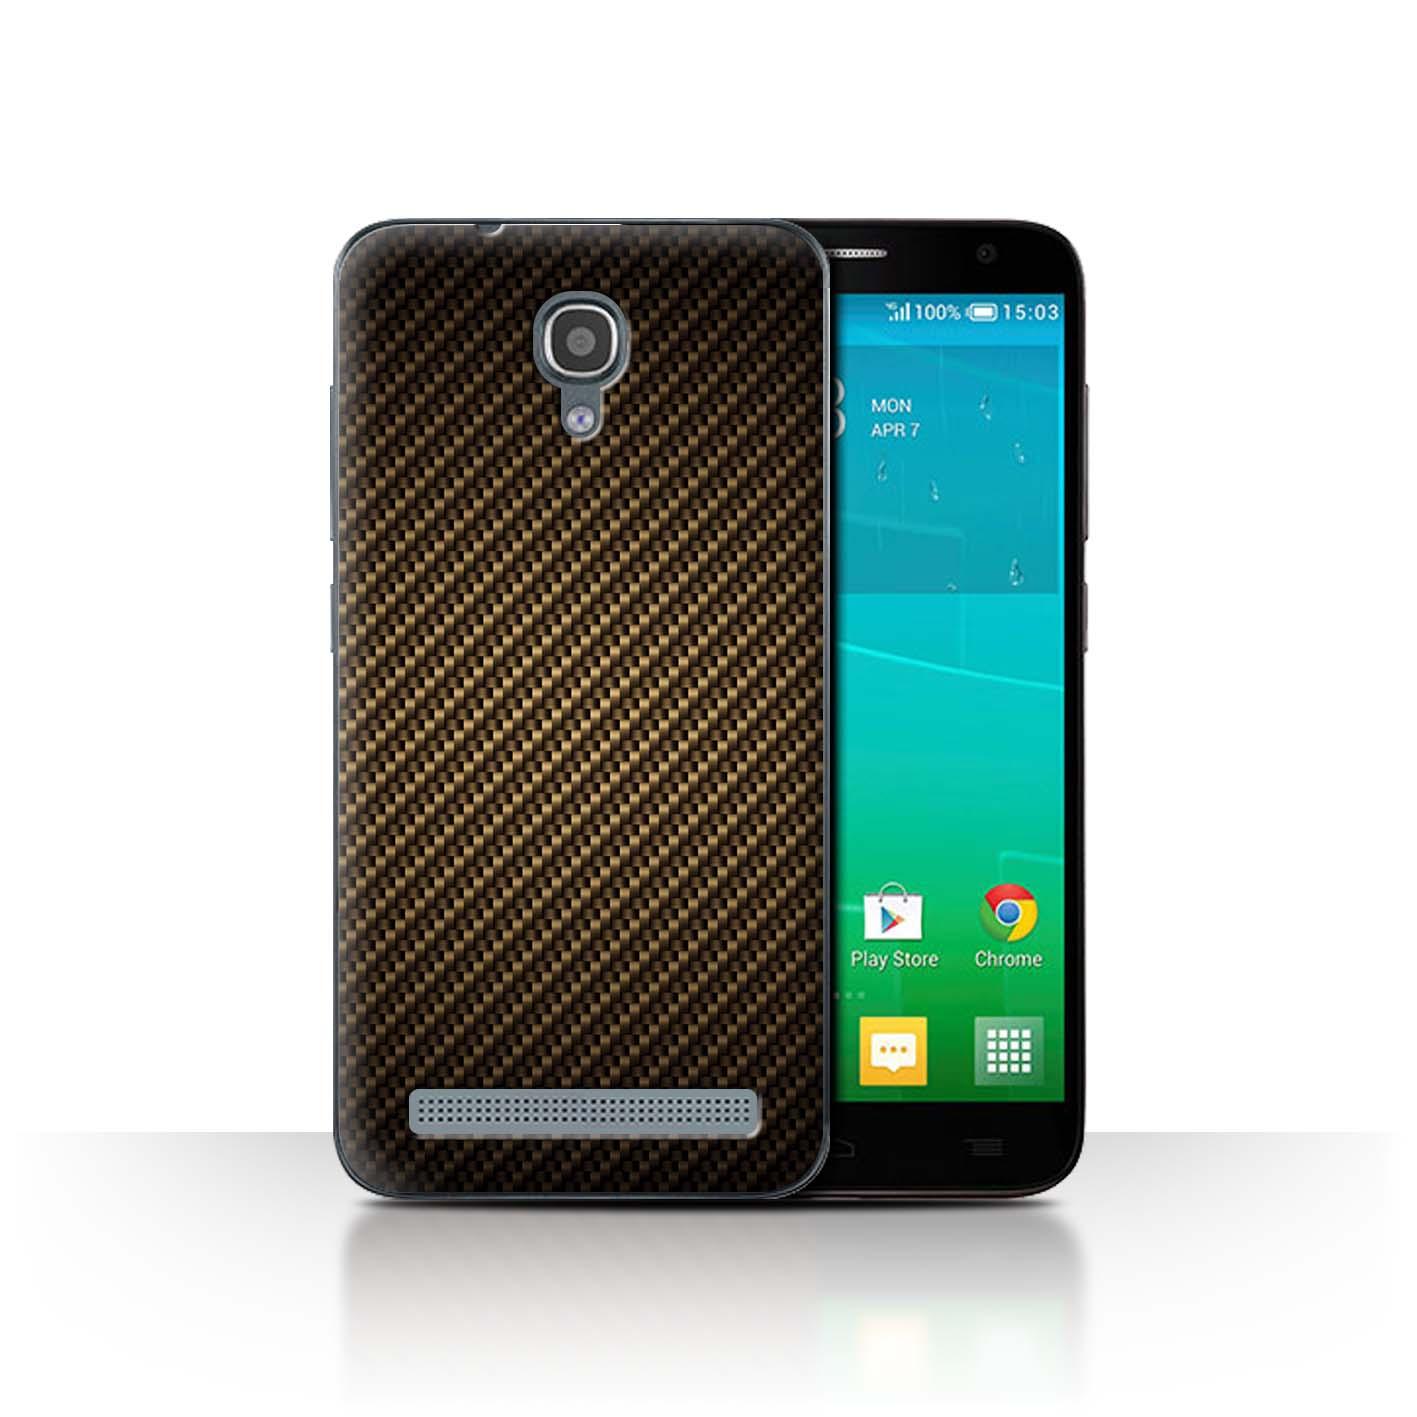 STUFF4-Back-Case-Cover-Skin-Alcatel-Idol-2-Mini-S-Carbon-Fibre-Effect-Pattern